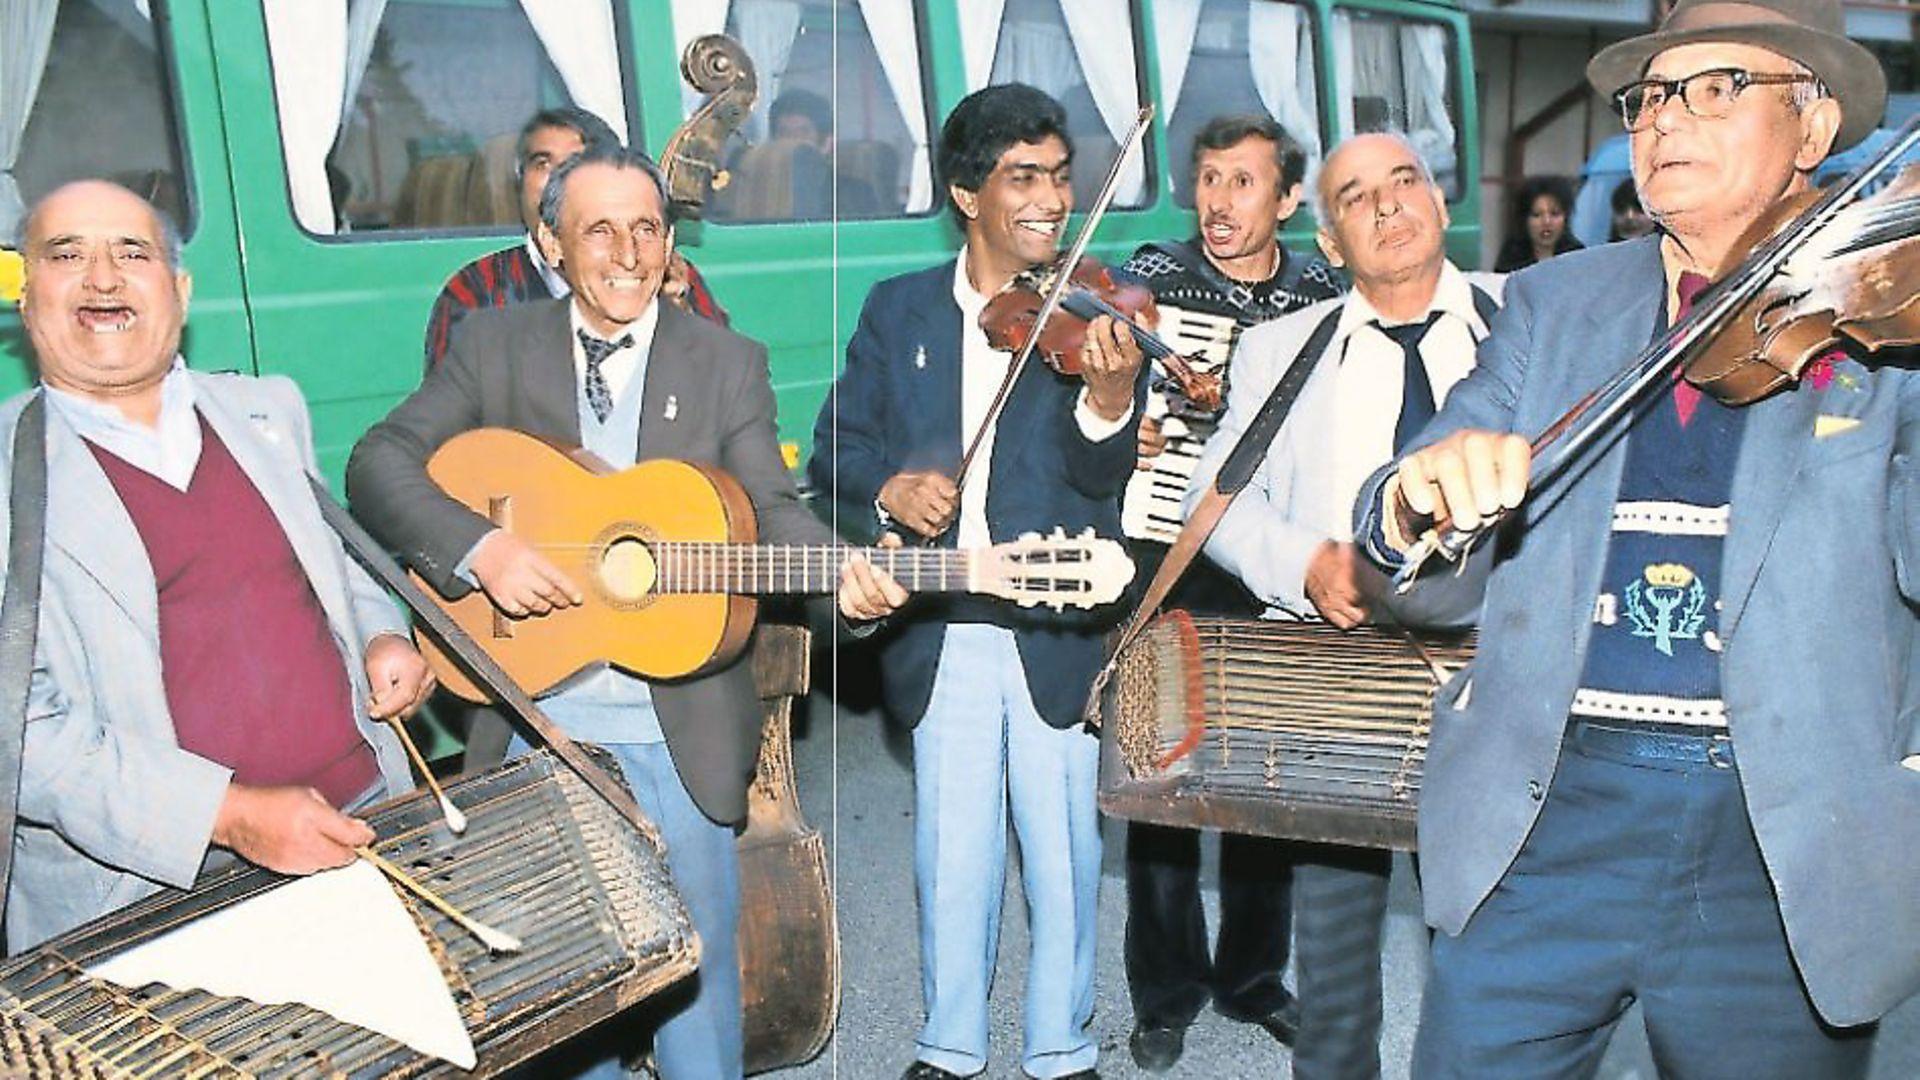 Romanian 'authentic' folk band Taraf de Haidouks. Phoco: Getty Images - Credit: Archant